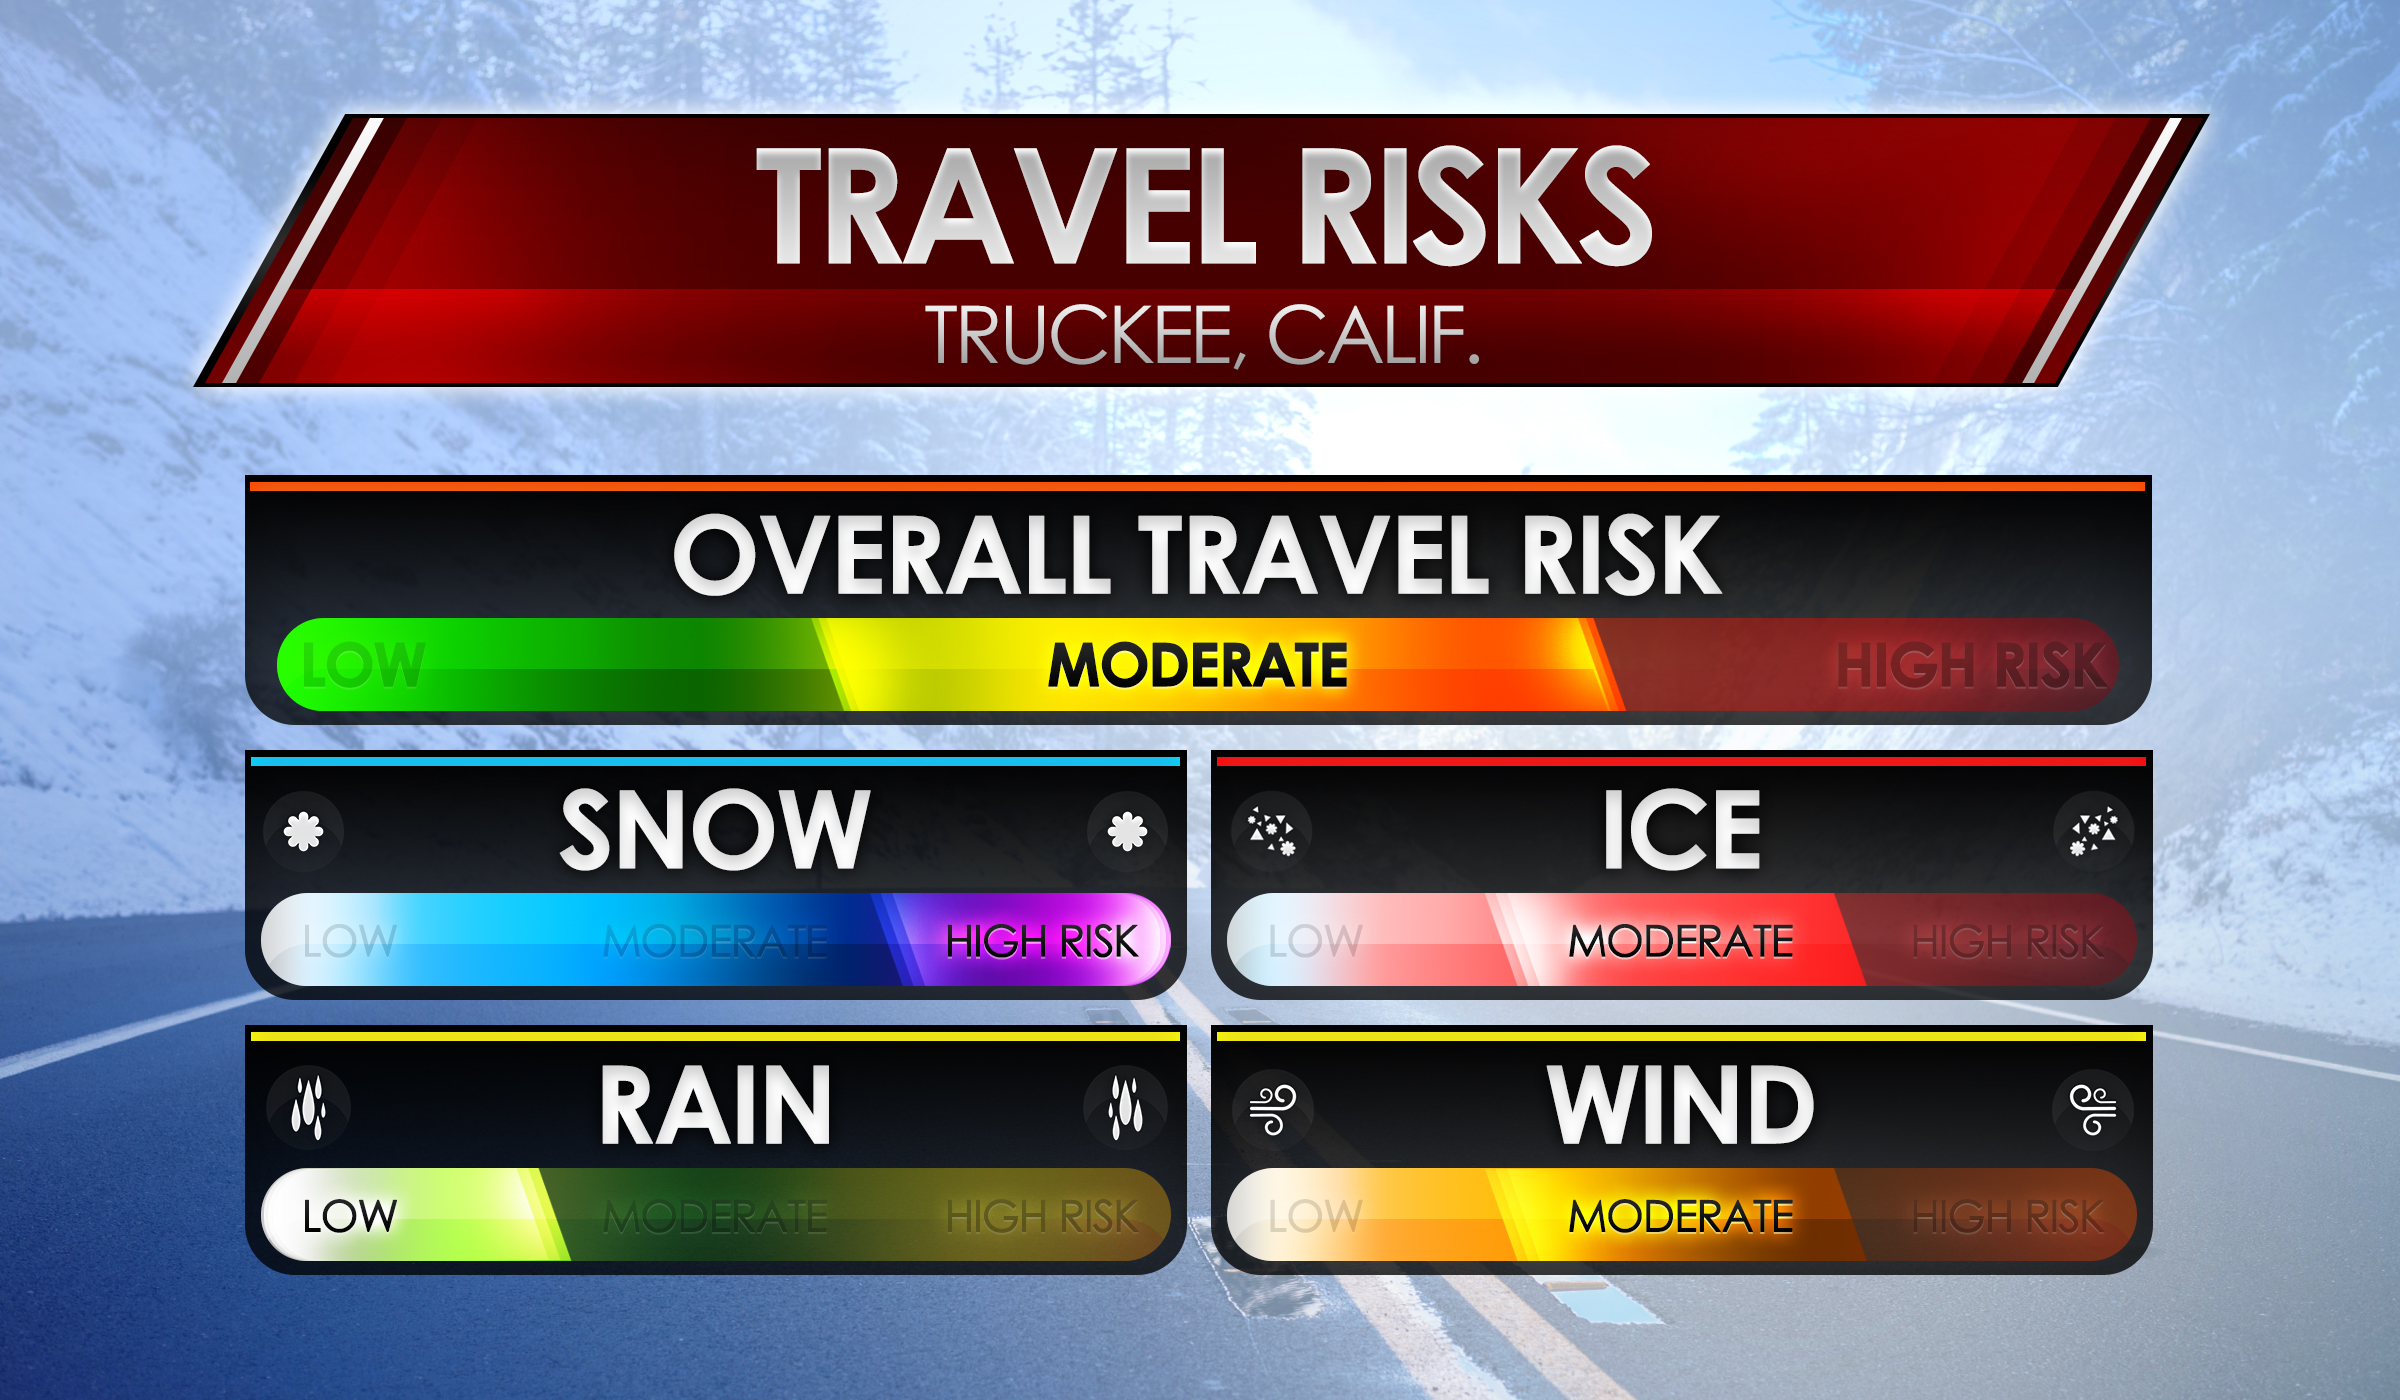 Travel Risk Truckee